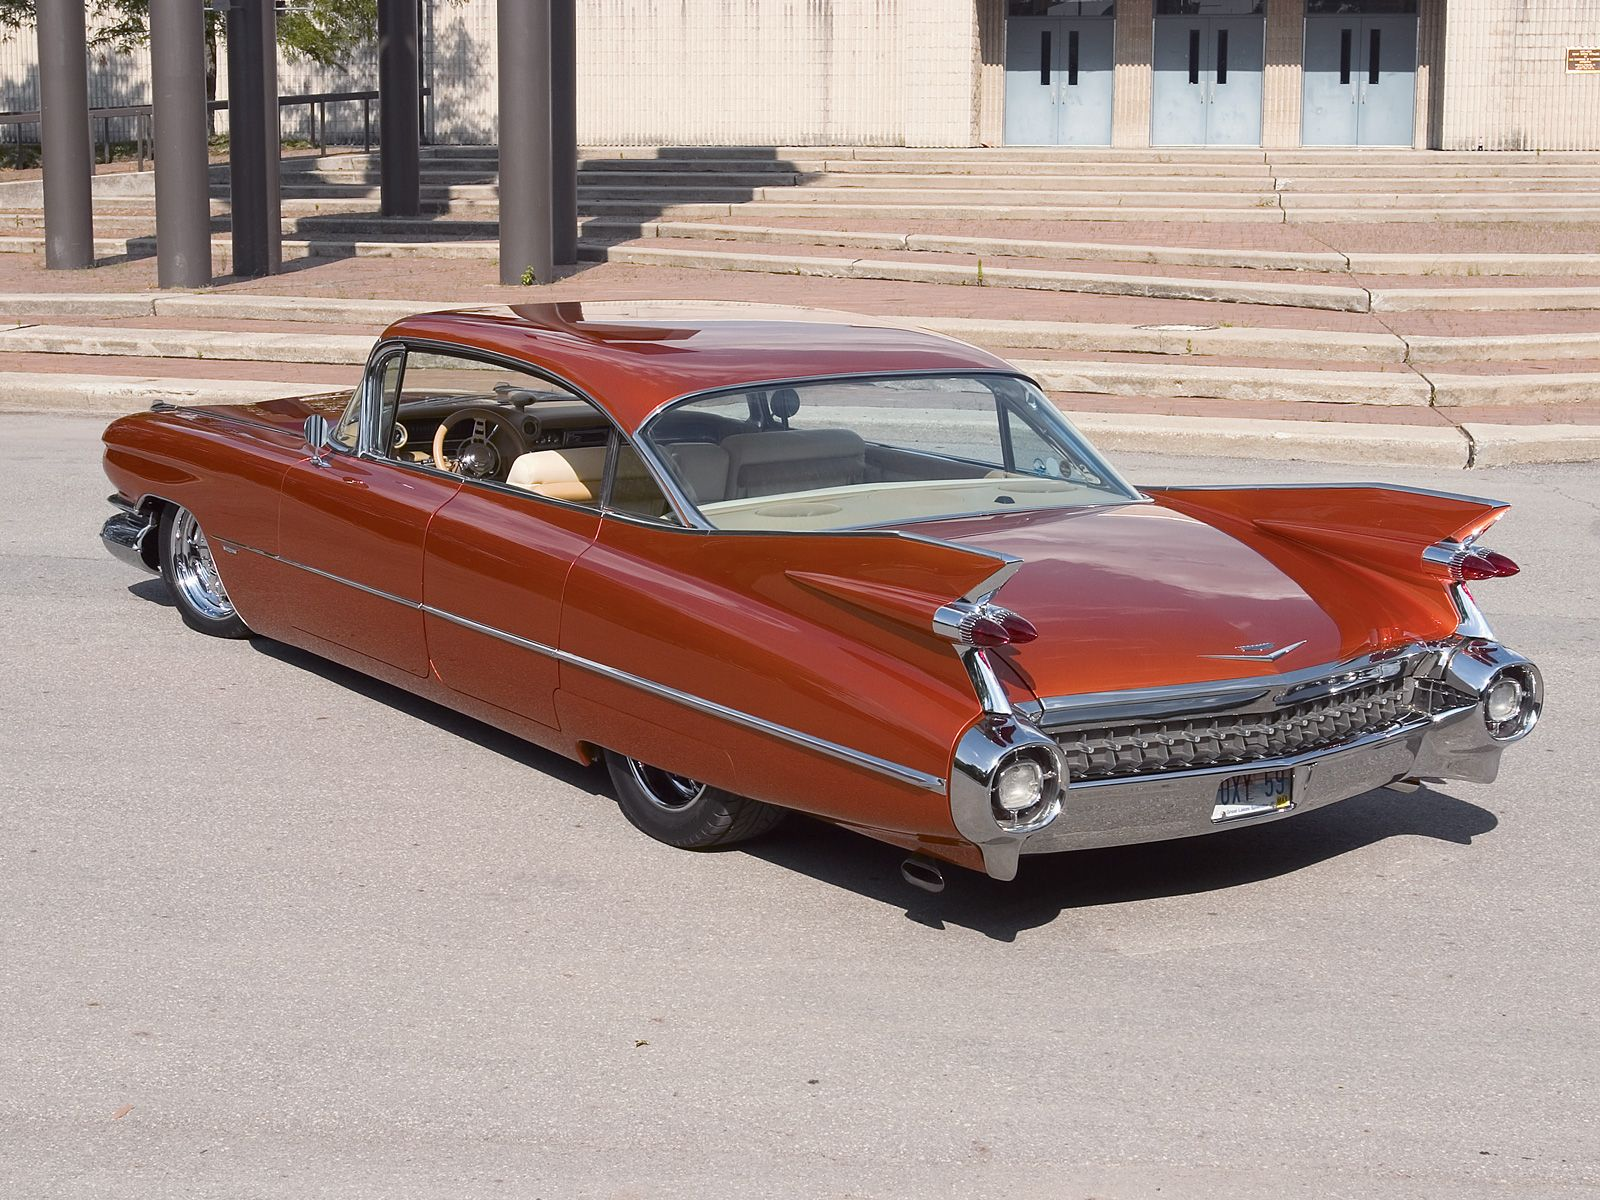 1959_chevy_cadillac_series_62 cars pinterest cadillac series 62 cadillac and 1959 cadillac